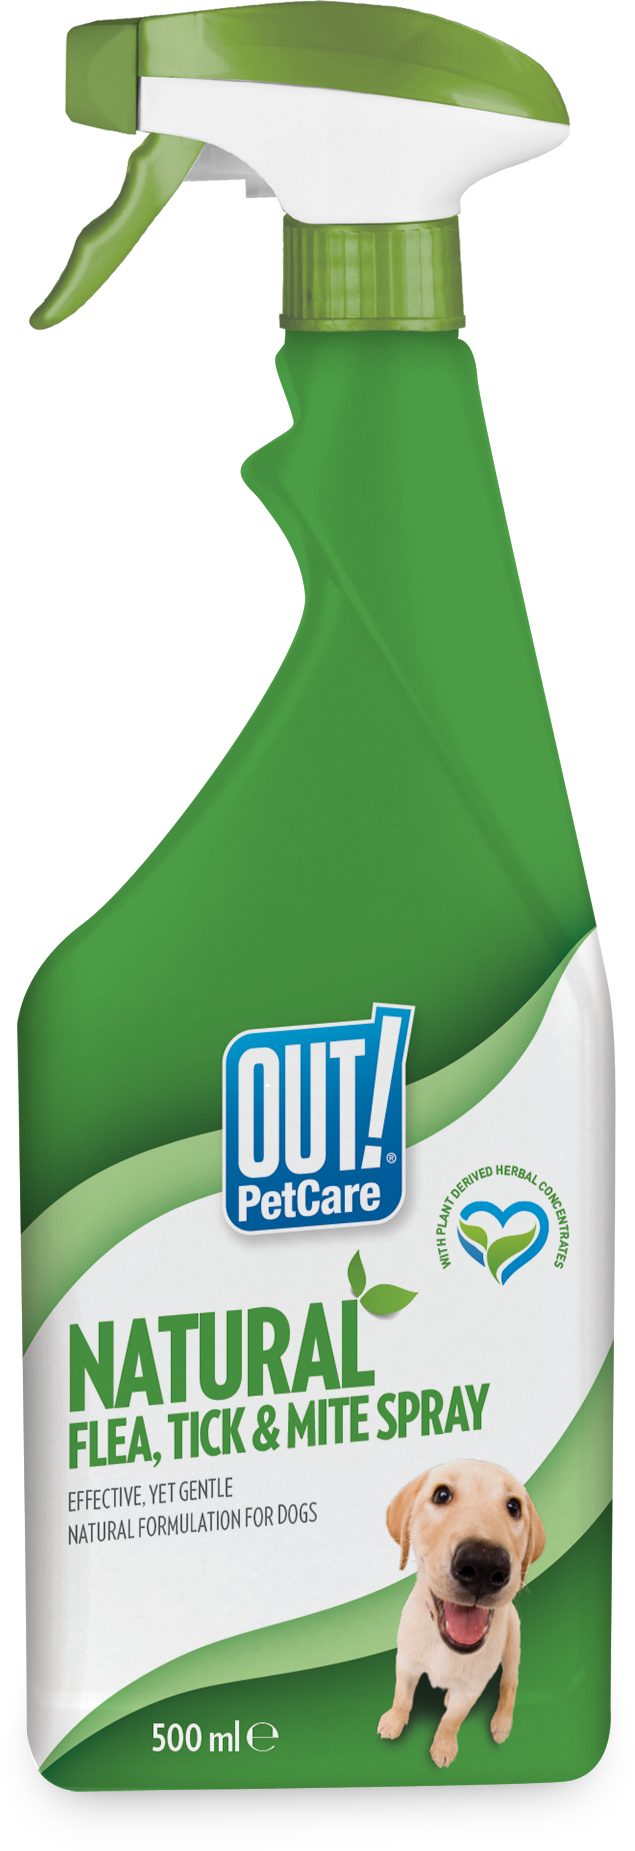 Out Petcare Natural Flea, Tick  & Mite Spray